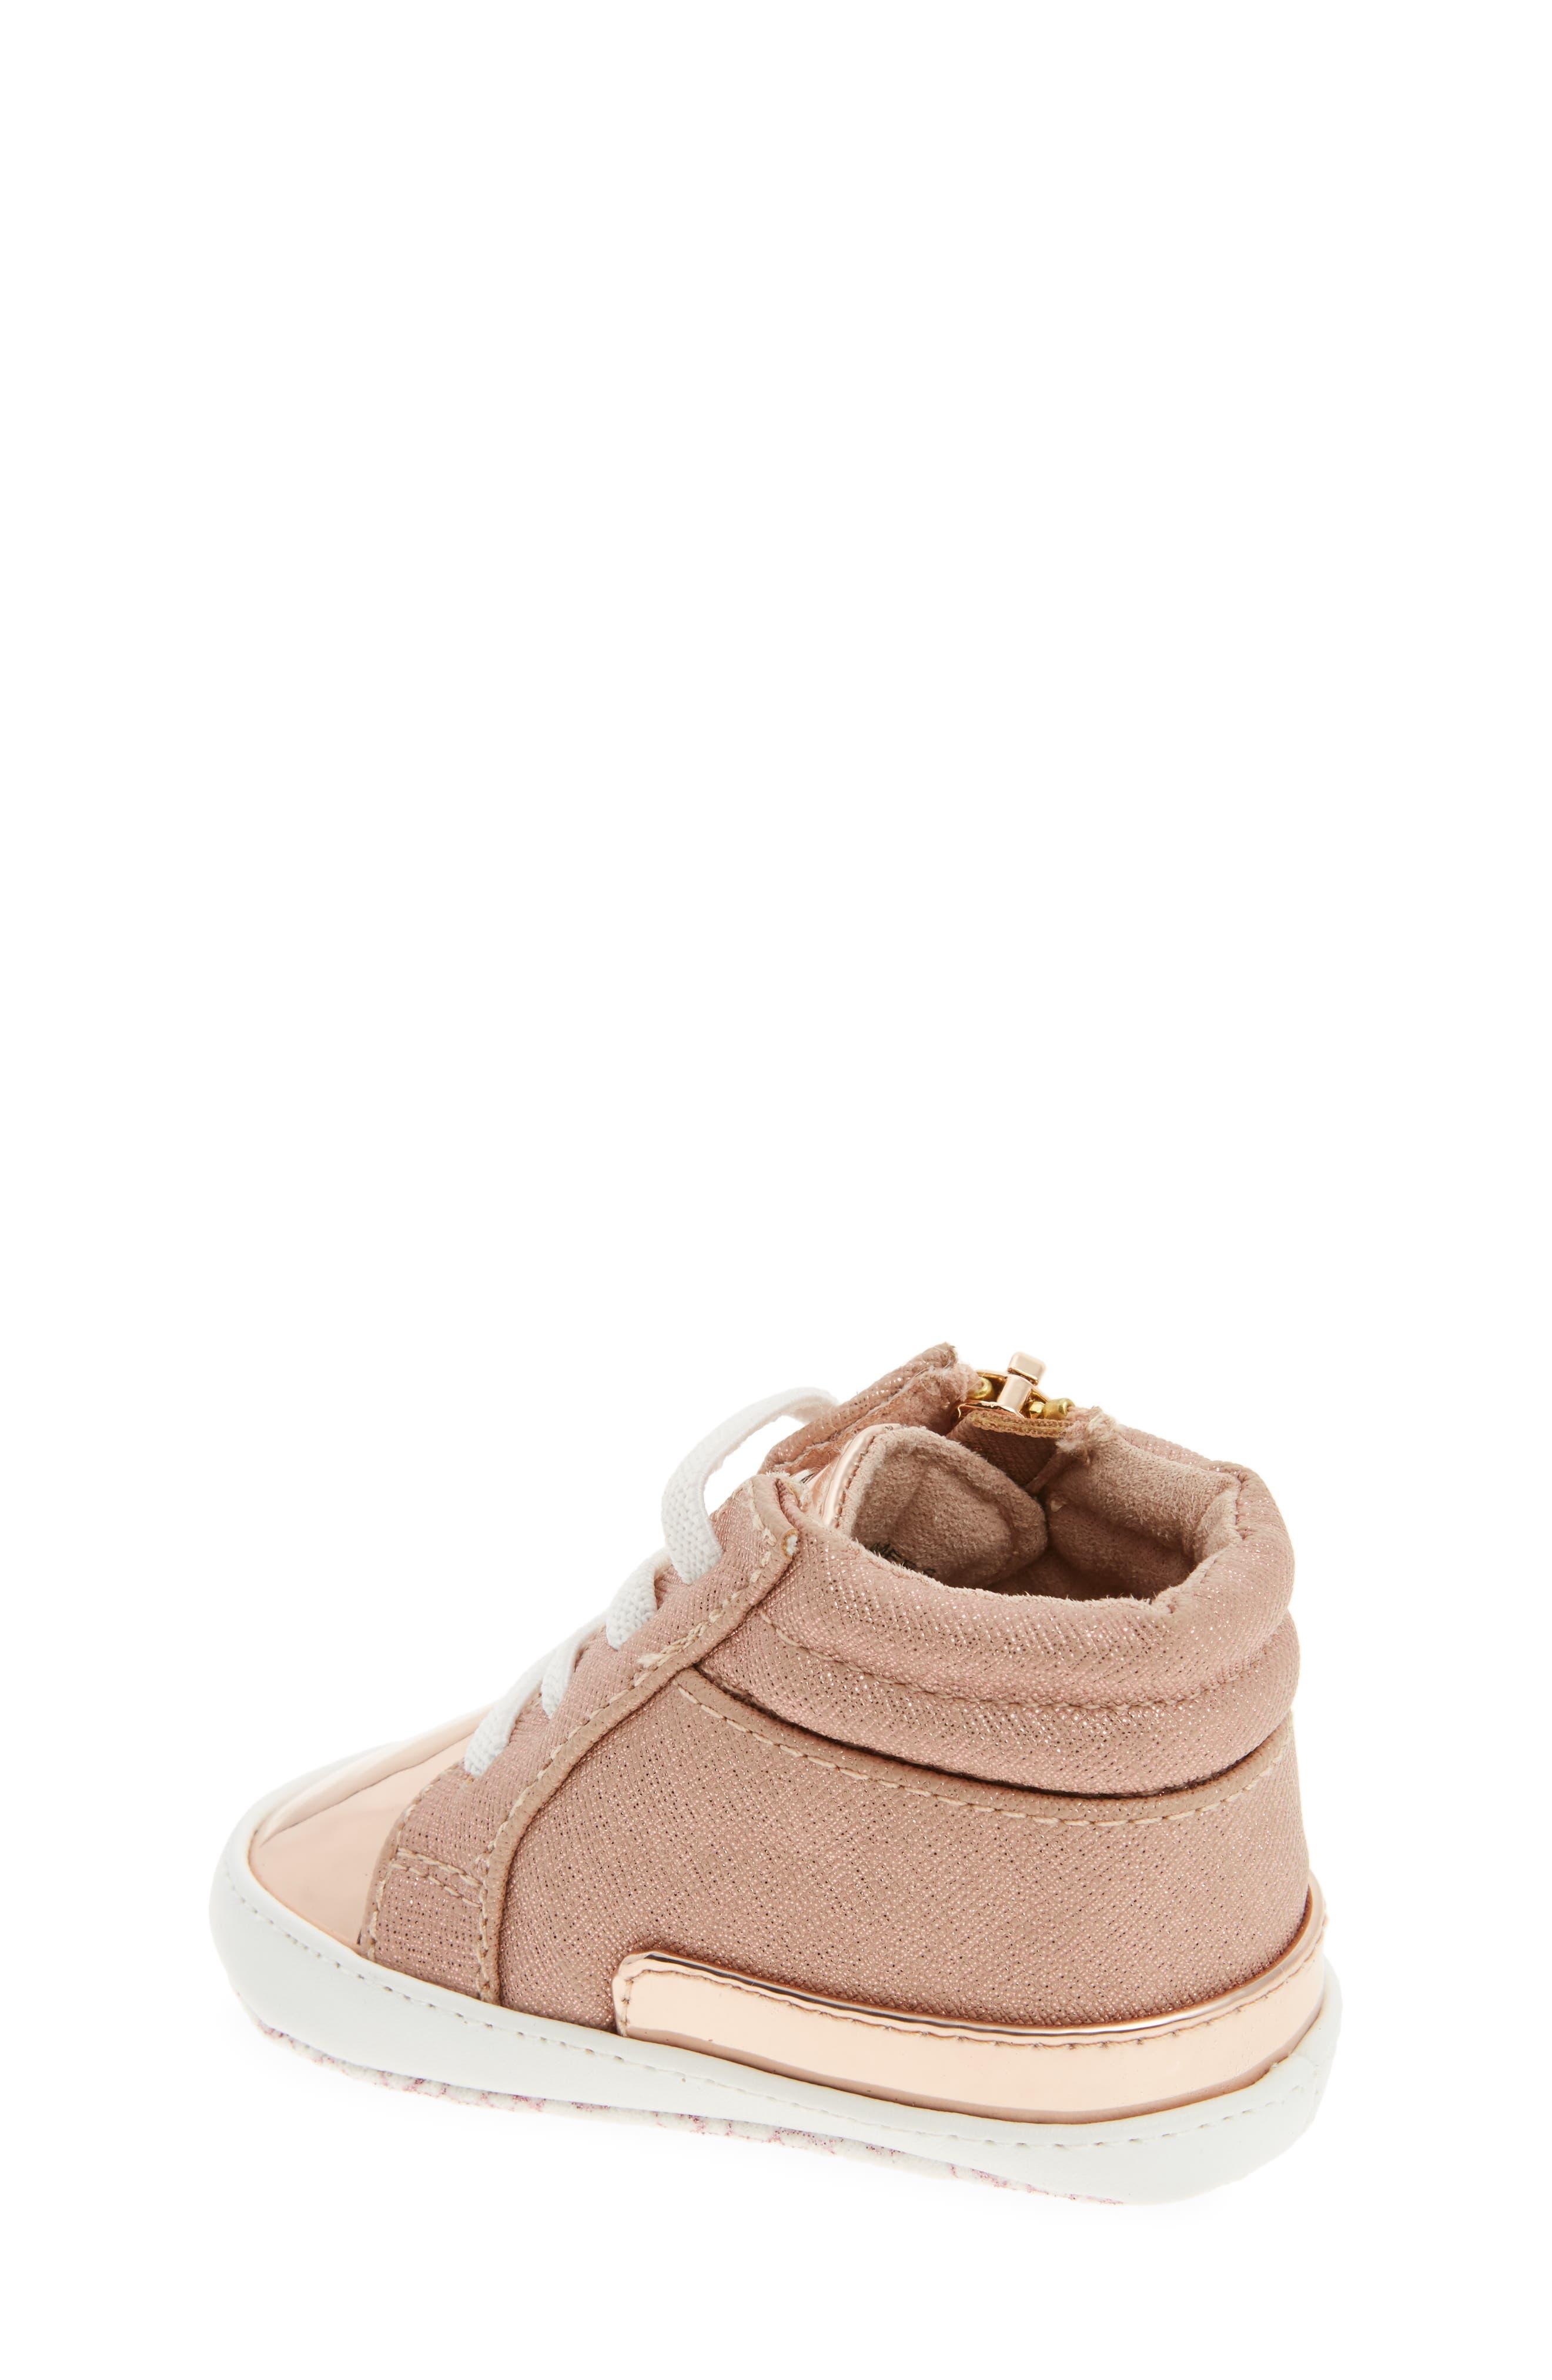 Baby Bleu High-Top Crib Shoe,                             Alternate thumbnail 2, color,                             Rose Gold